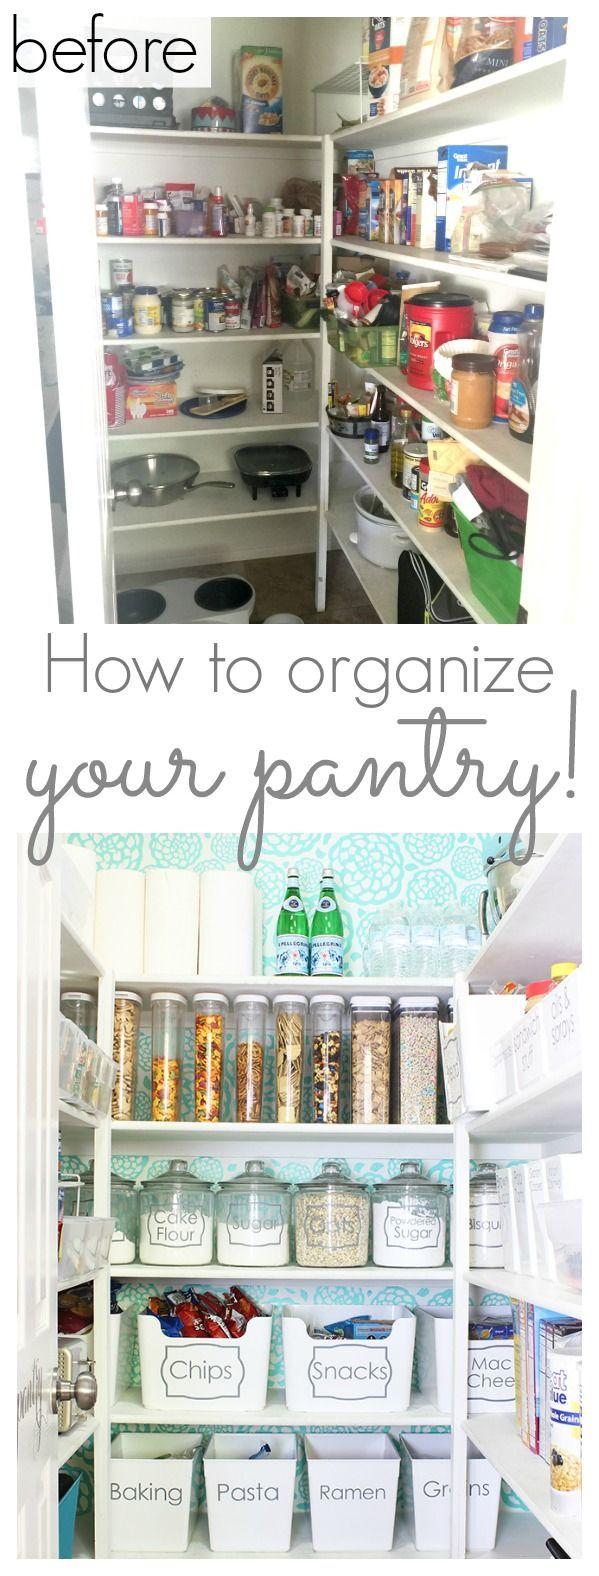 best kitchen images on pinterest organization ideas home ideas